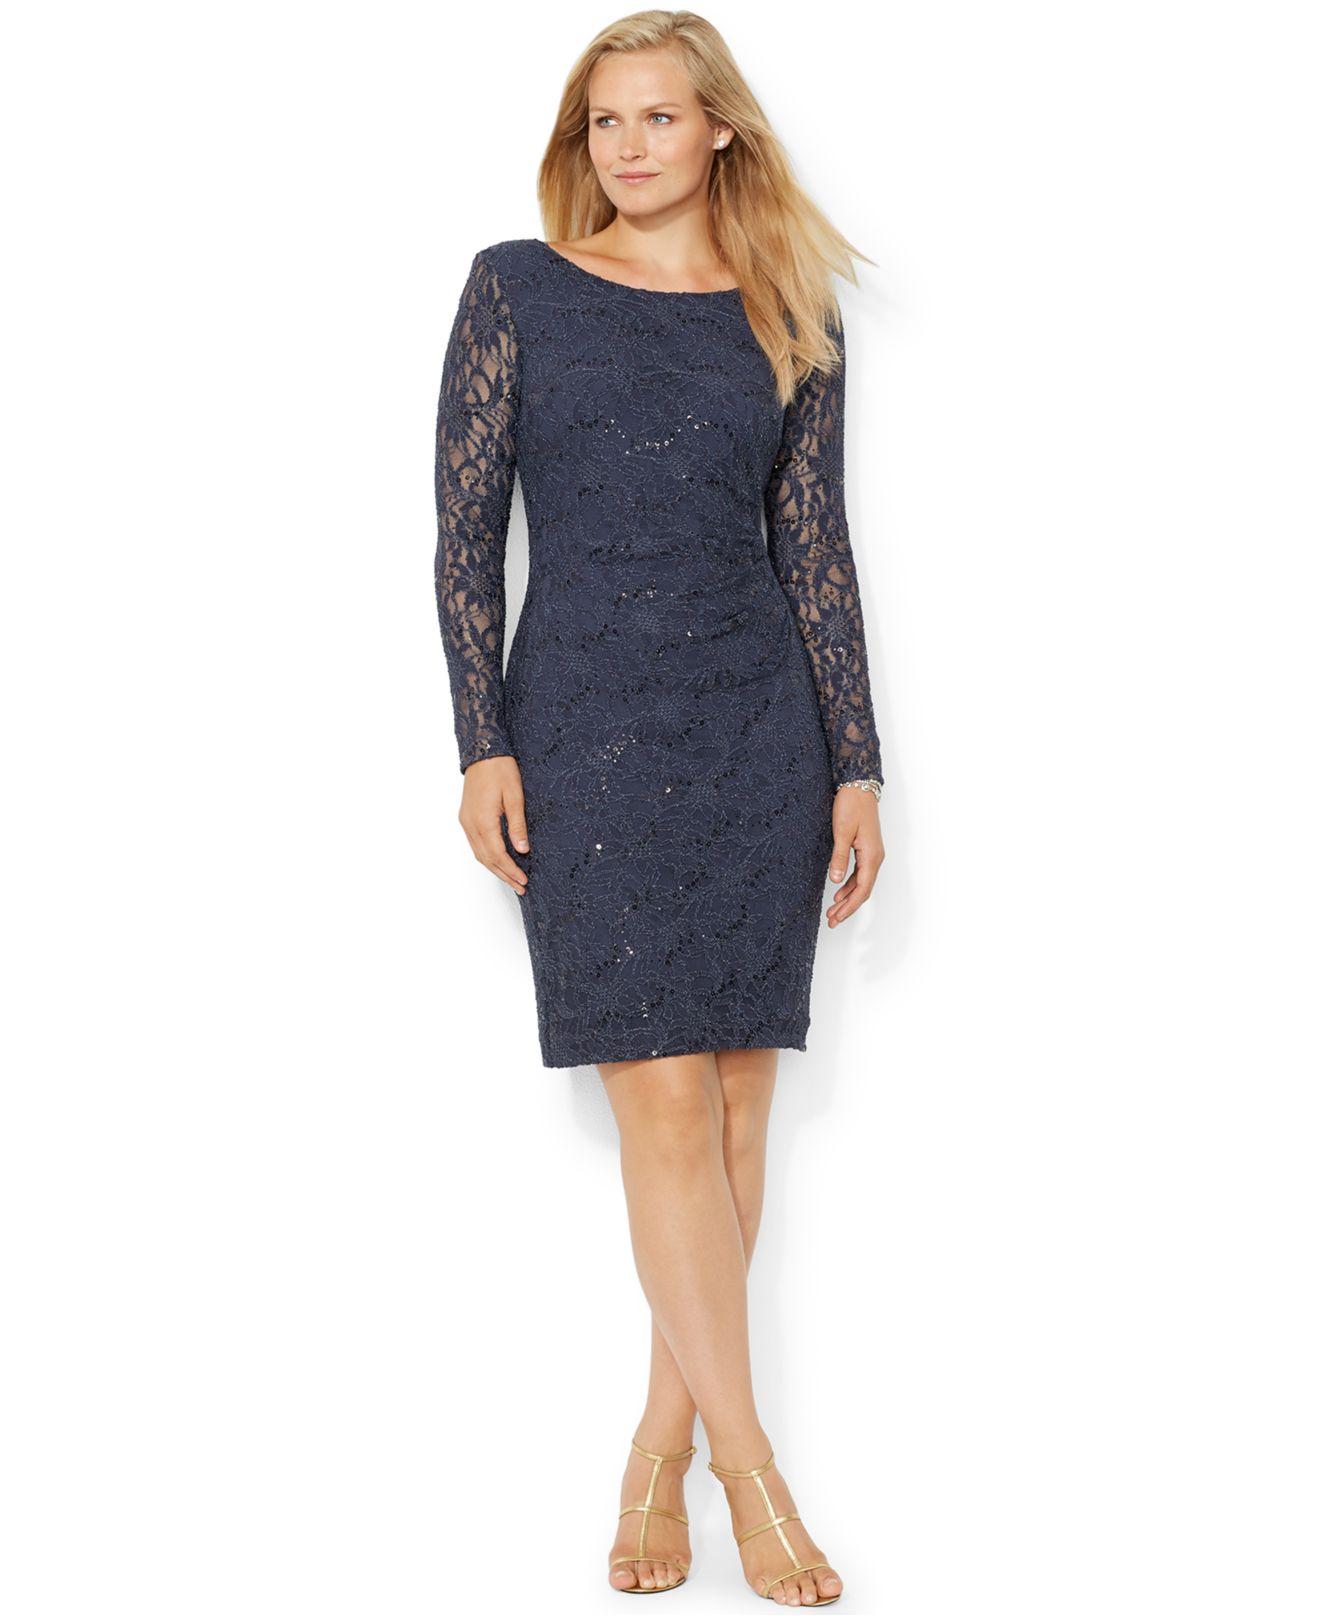 HD wallpapers plus size formal dresses asos